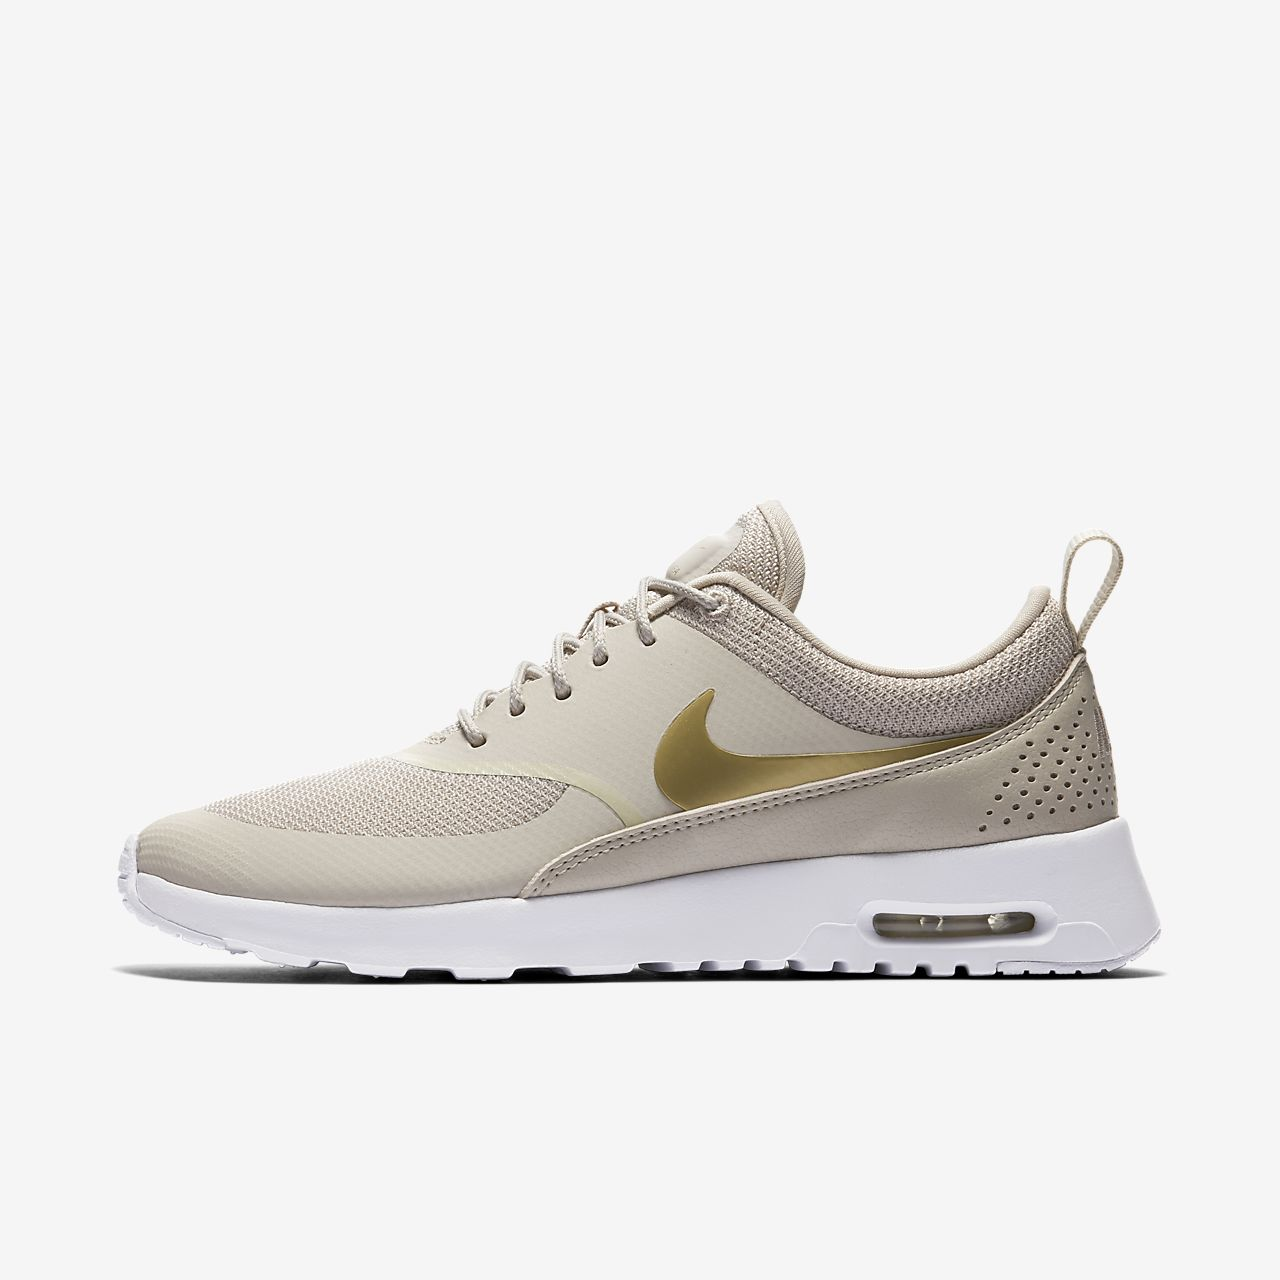 Nike W Nike Air Max Thea Damen 36 Beige fat84XFg1